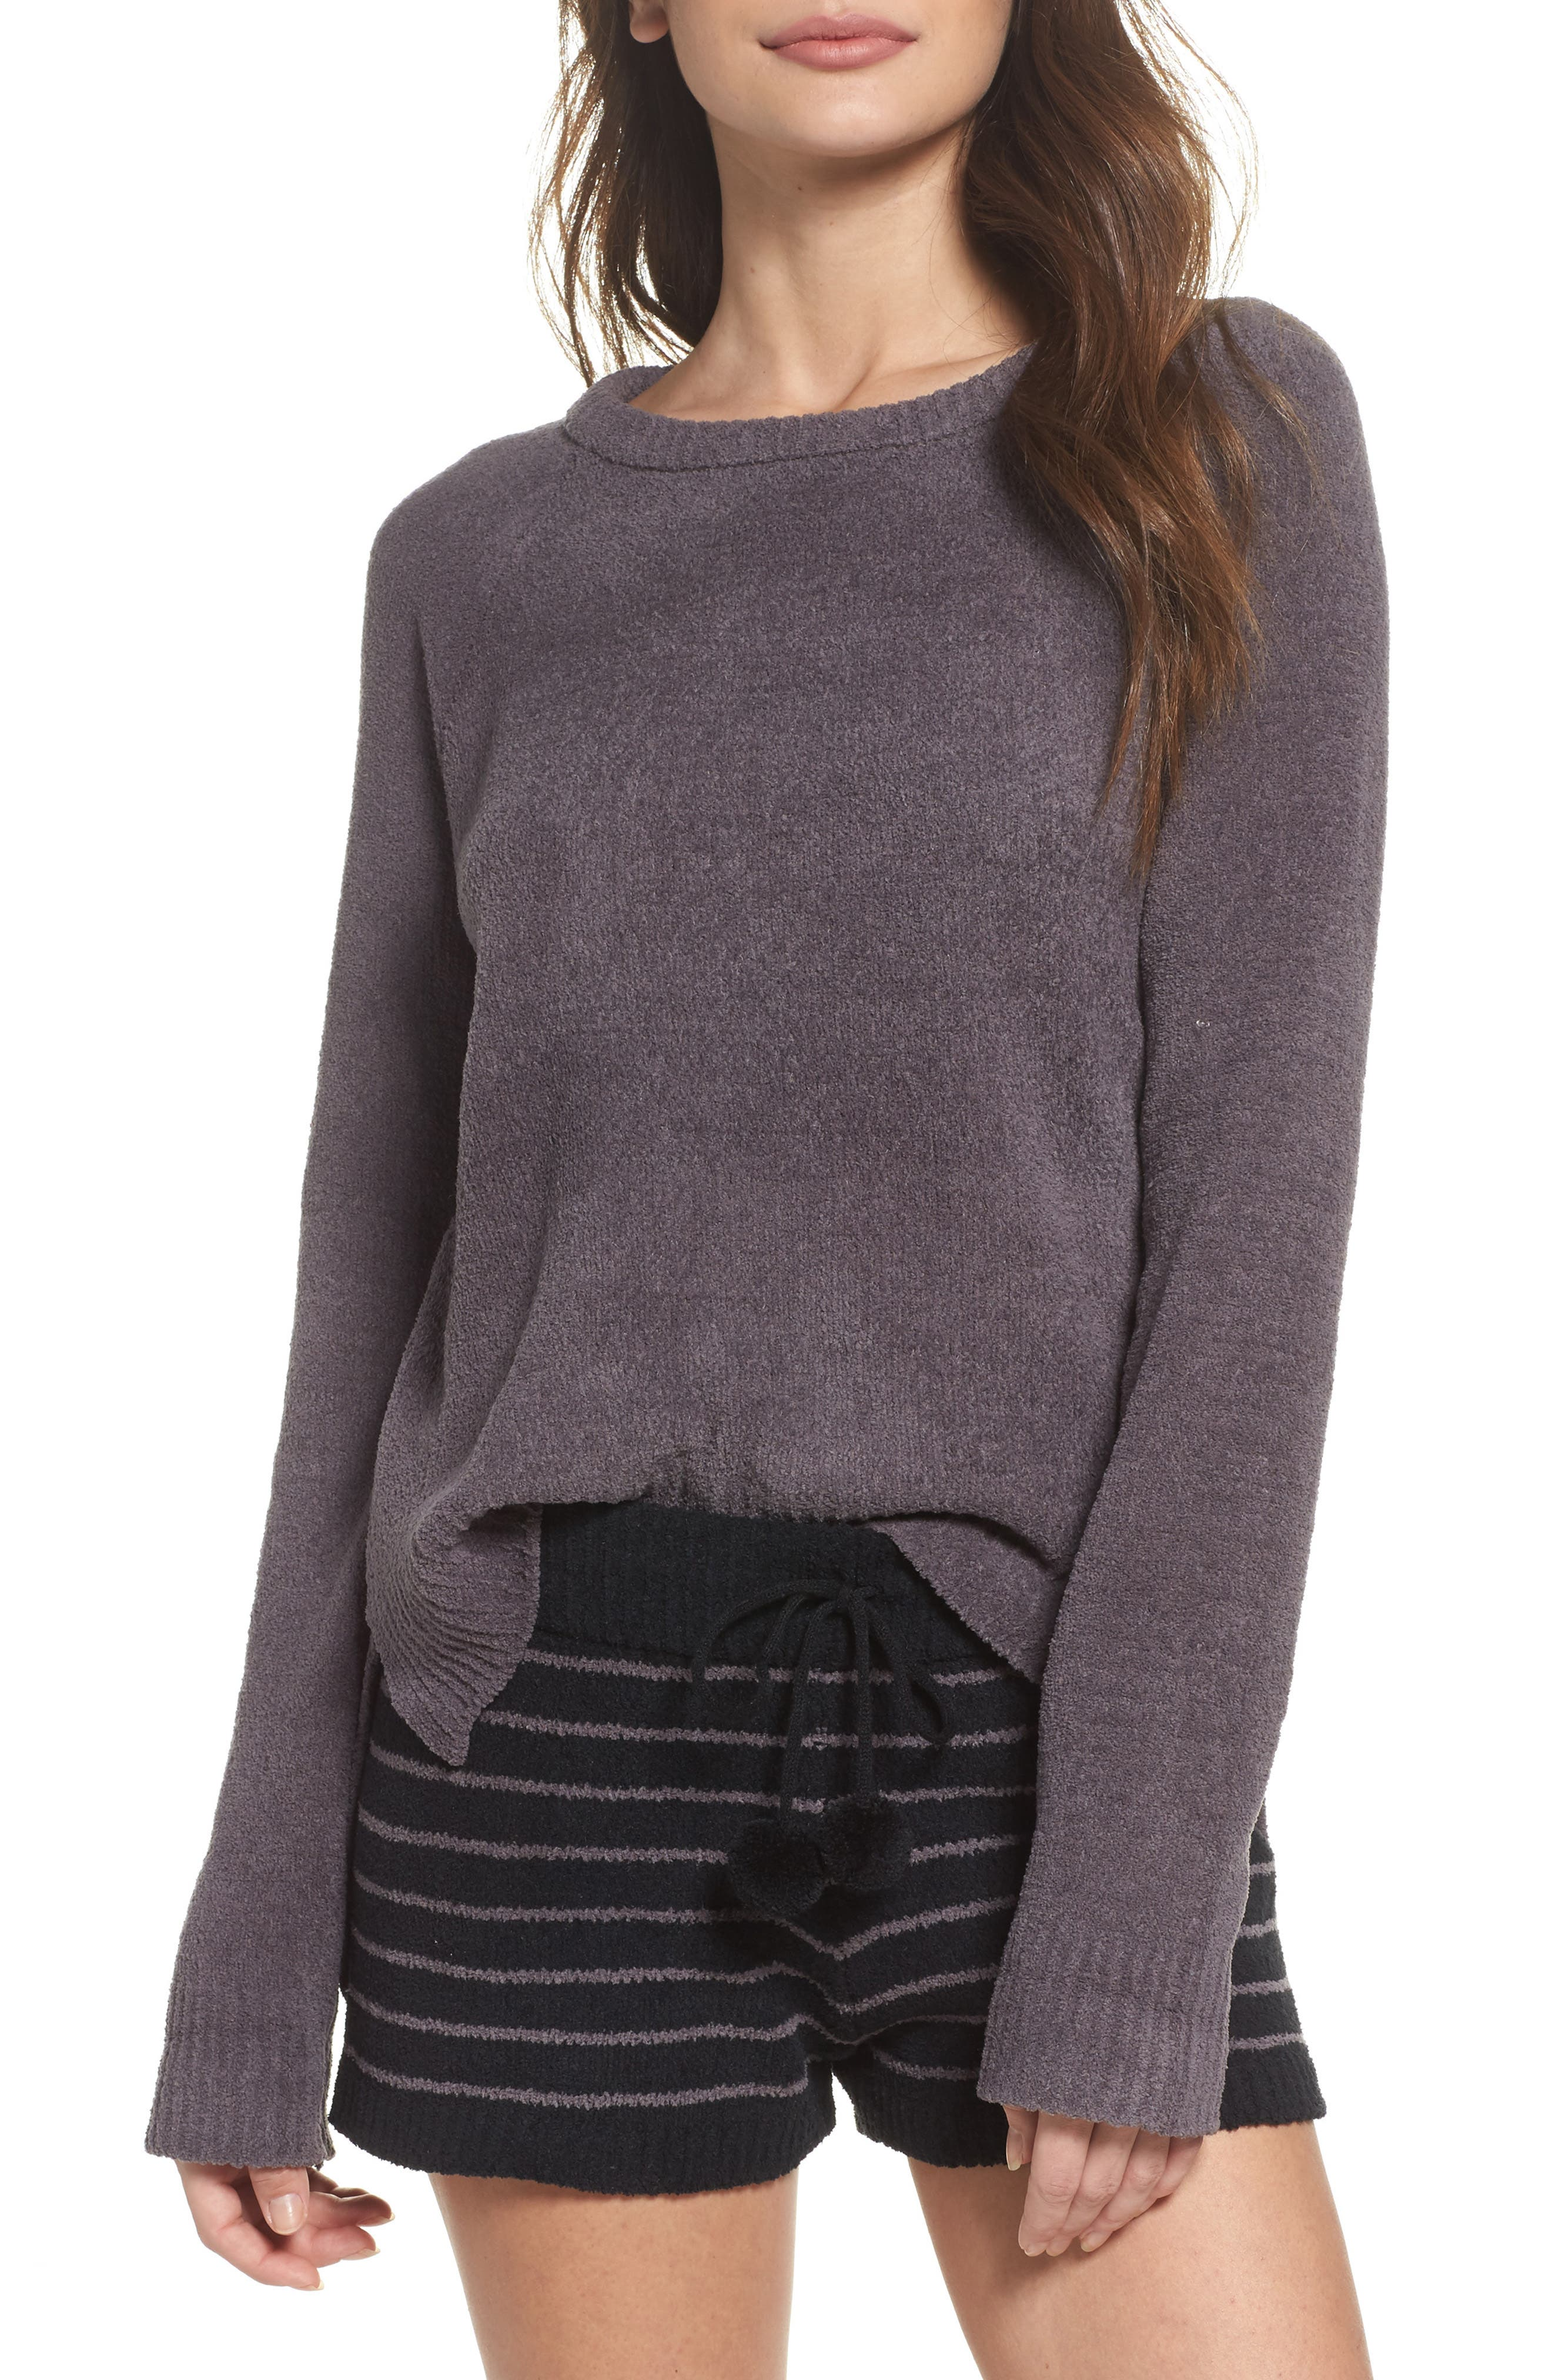 Main Image - Honeydew Intimates Marshmallow Sweatshirt